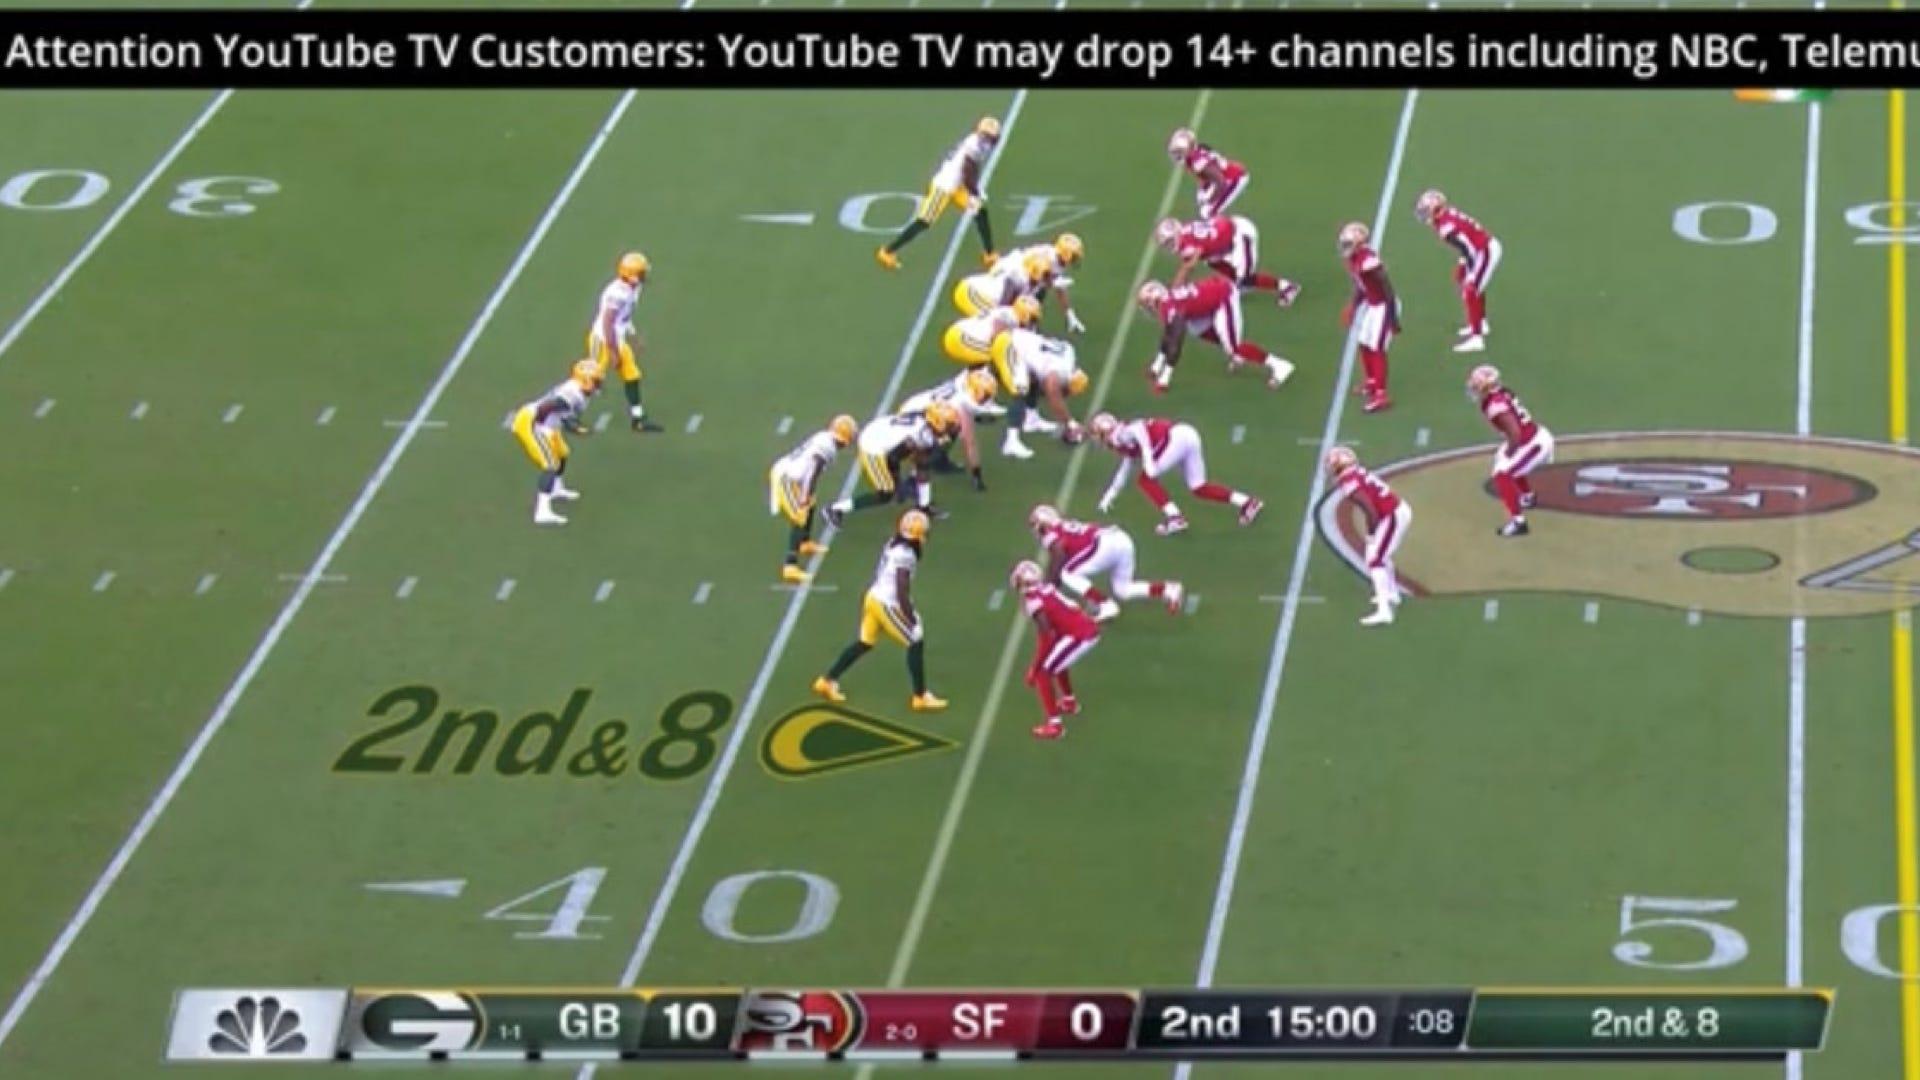 NBC YouTube TV disclaimer